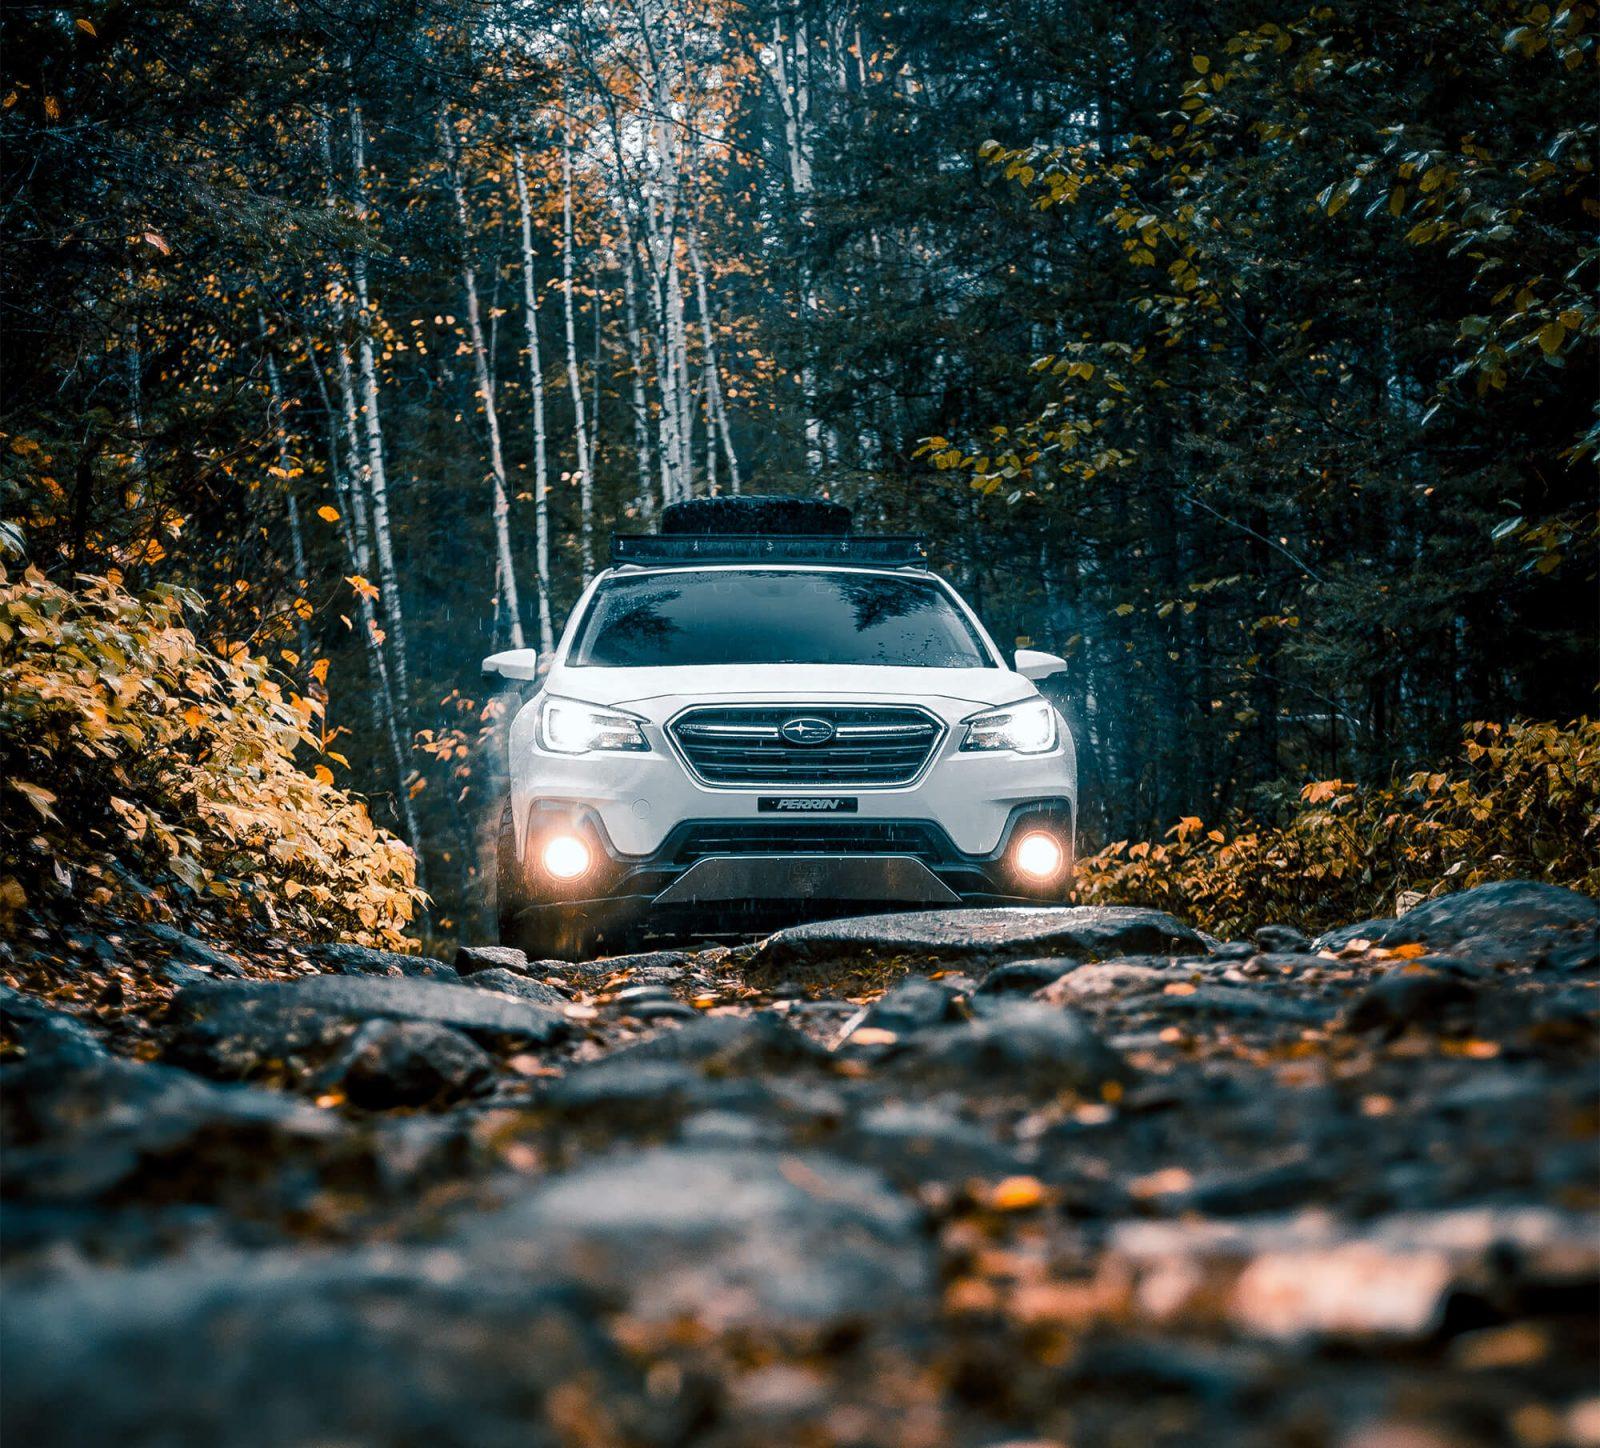 Lifted Subaru Outback offroading